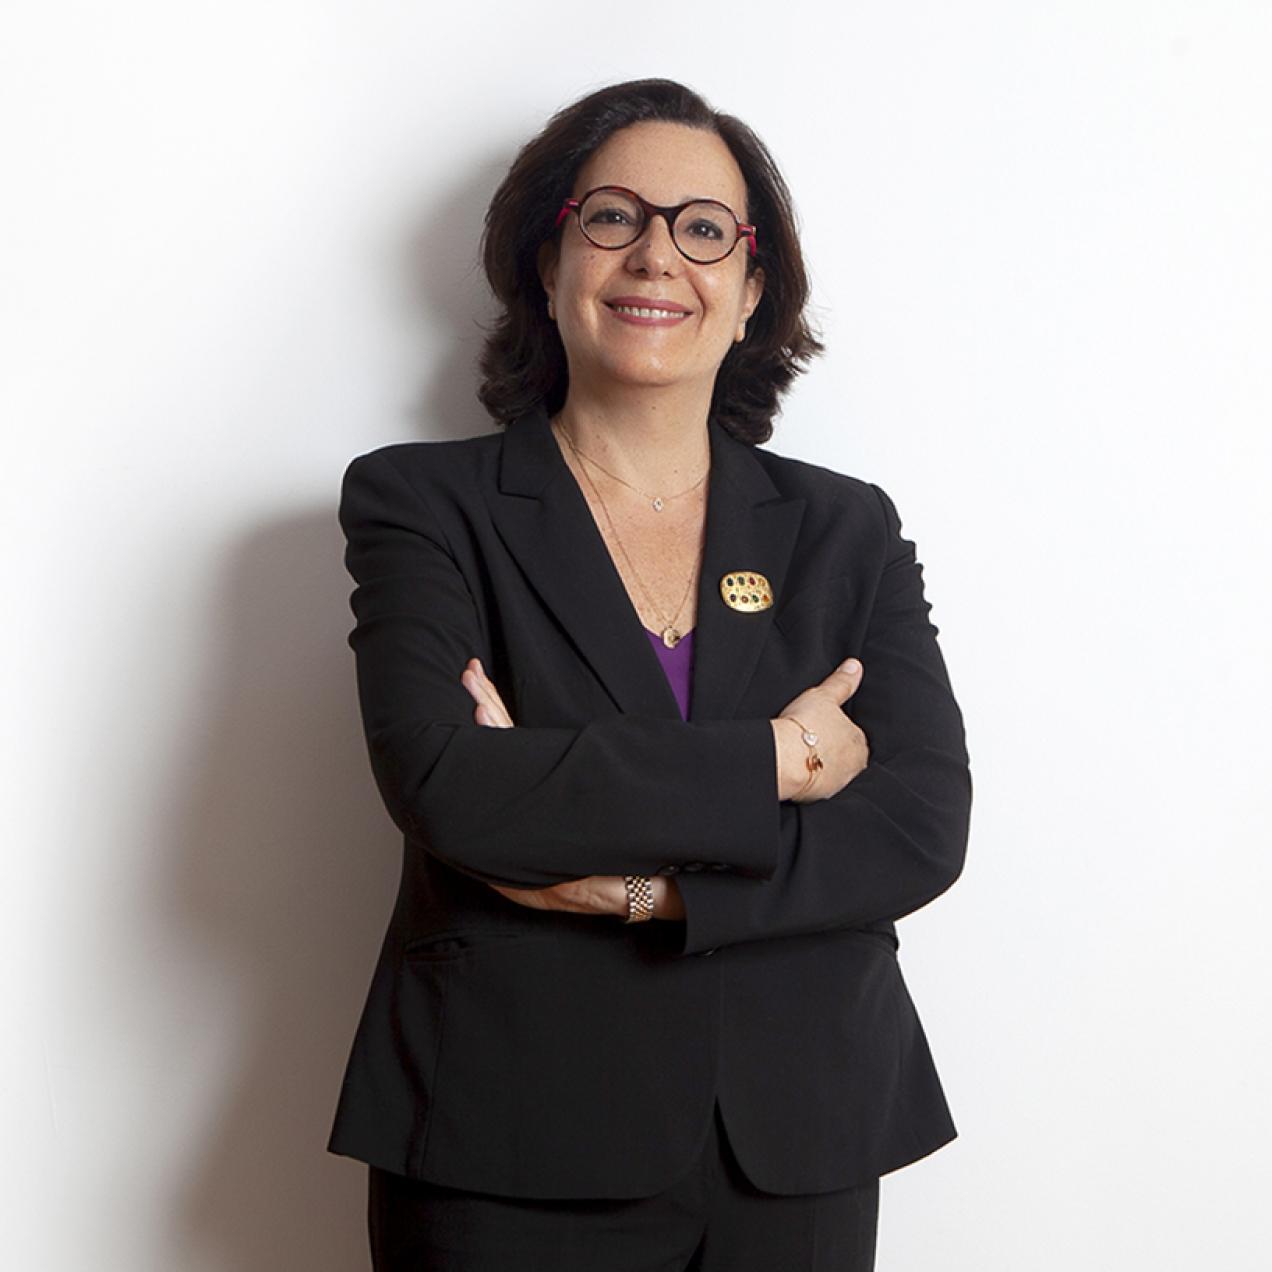 Samira Khamlichi